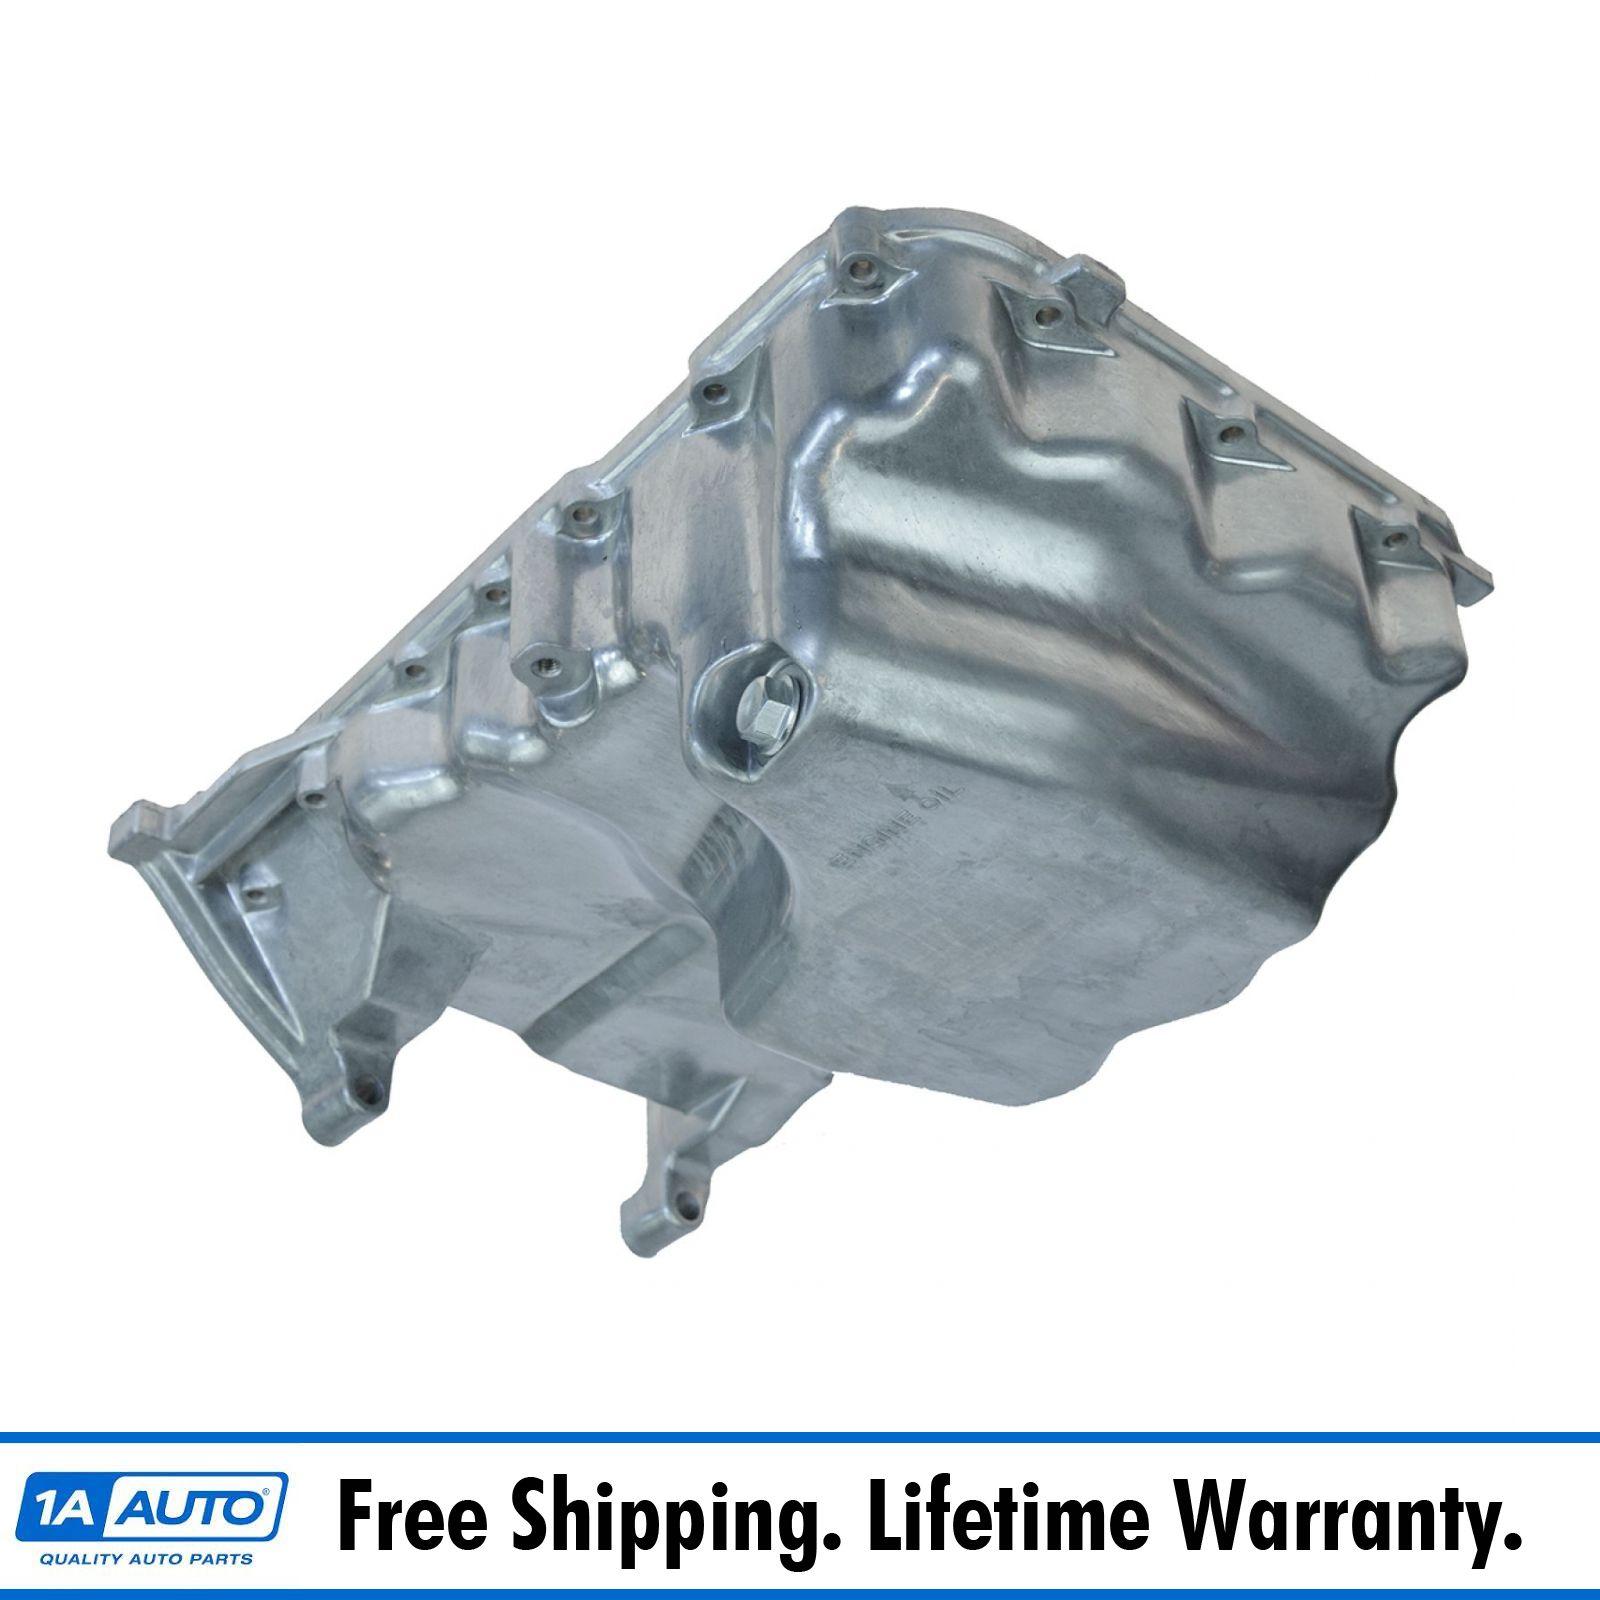 DORMAN 264-379 Engine Motor Oil Pan For Honda Accord